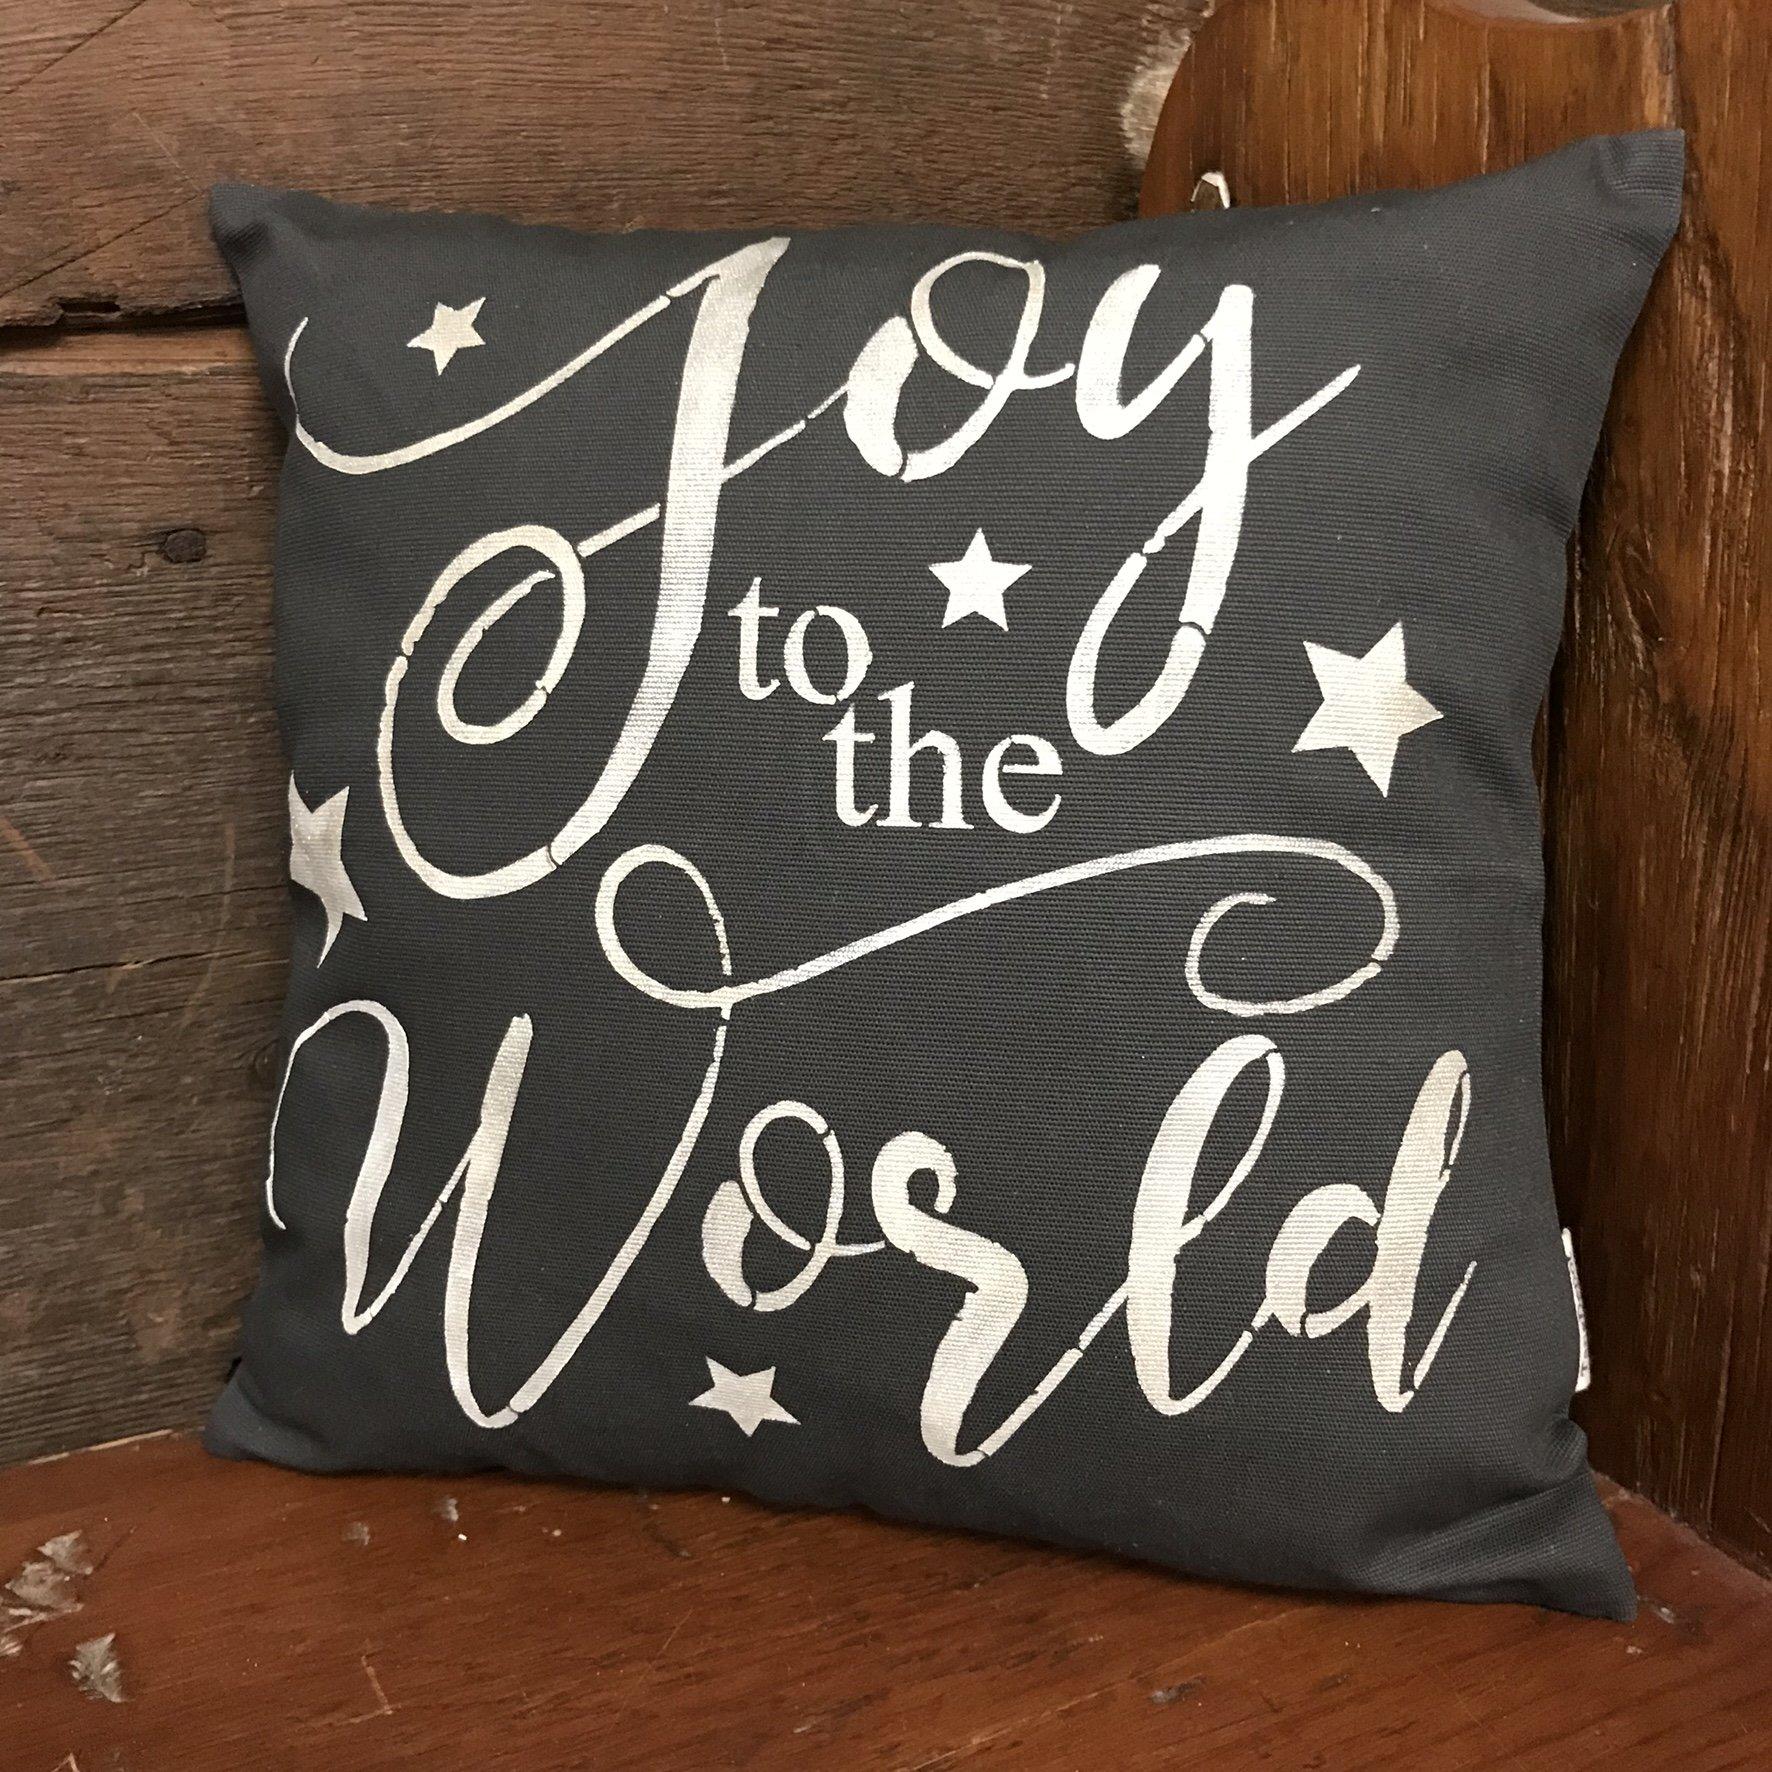 Designer Stencils Joy to The World Stencil (10 mil Plastic)